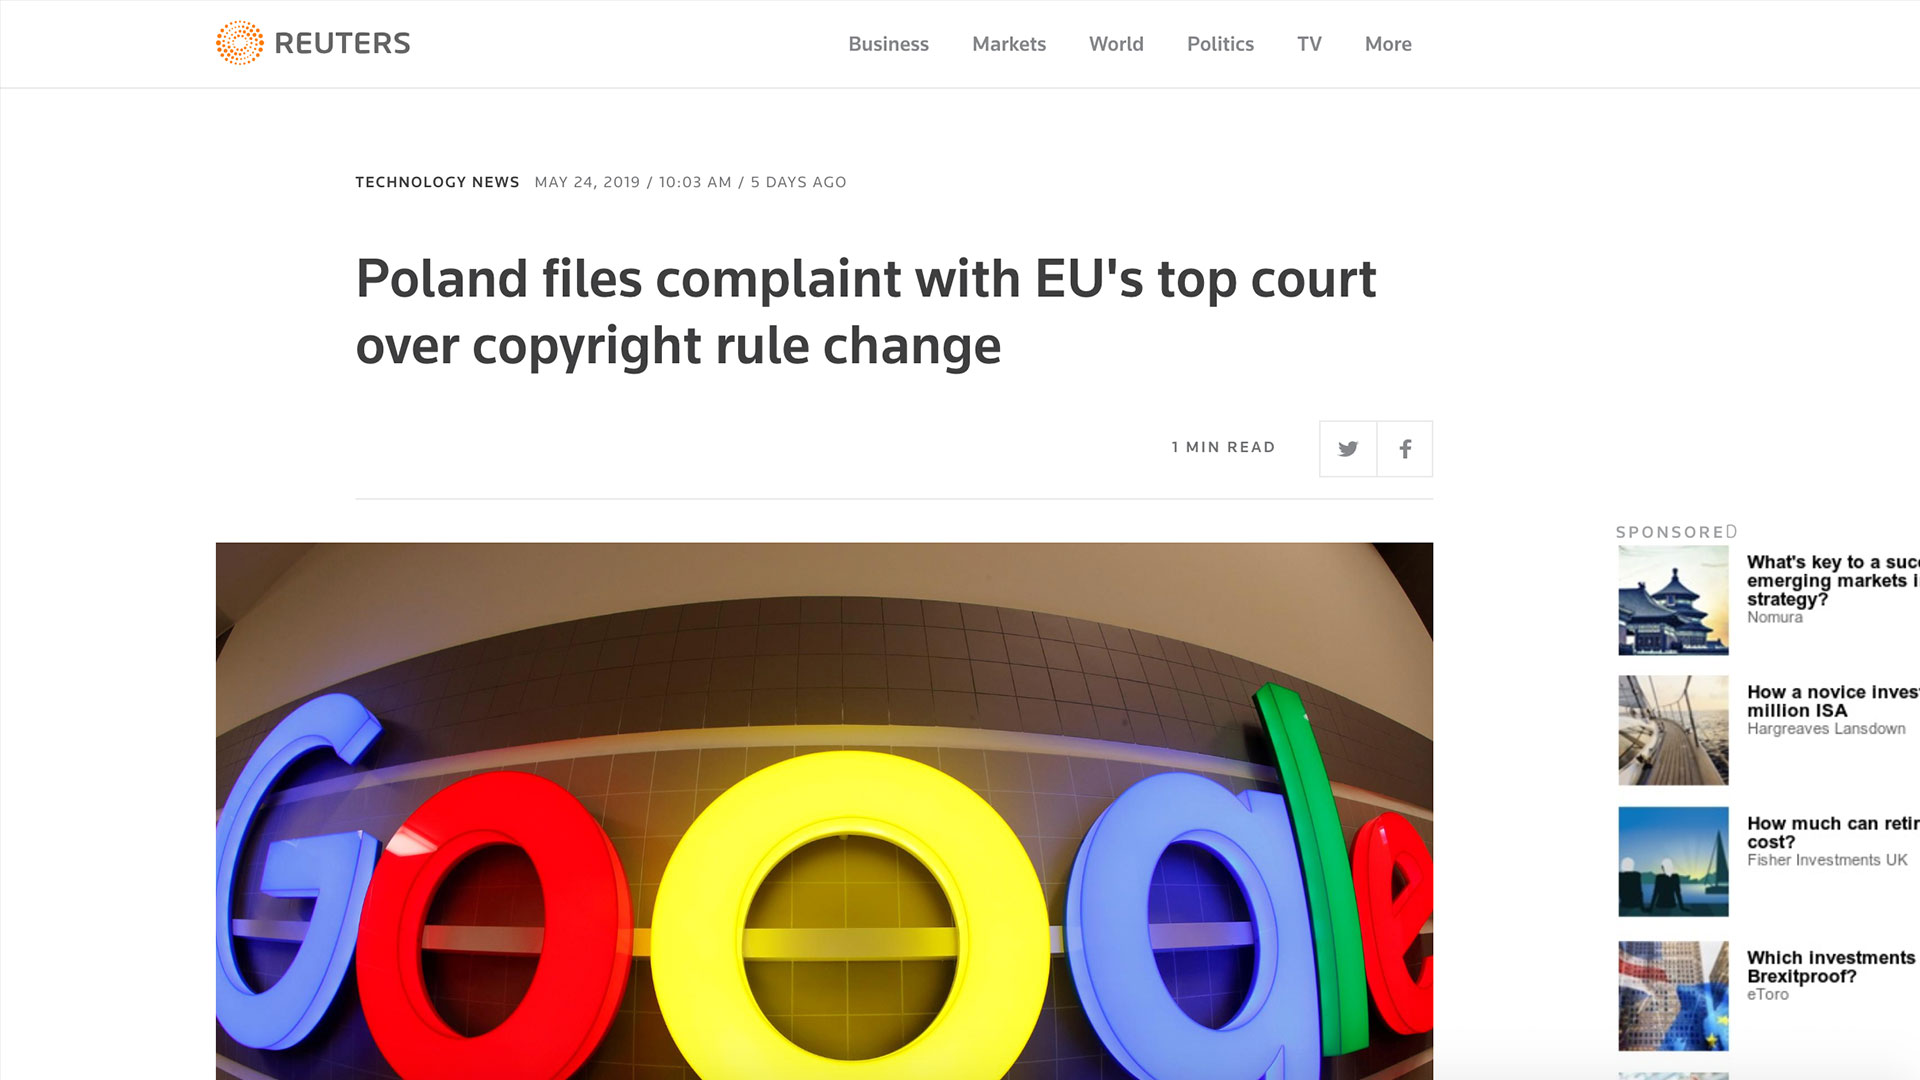 Fairness Rocks News Poland files complaint with EU's top court over copyright rule change